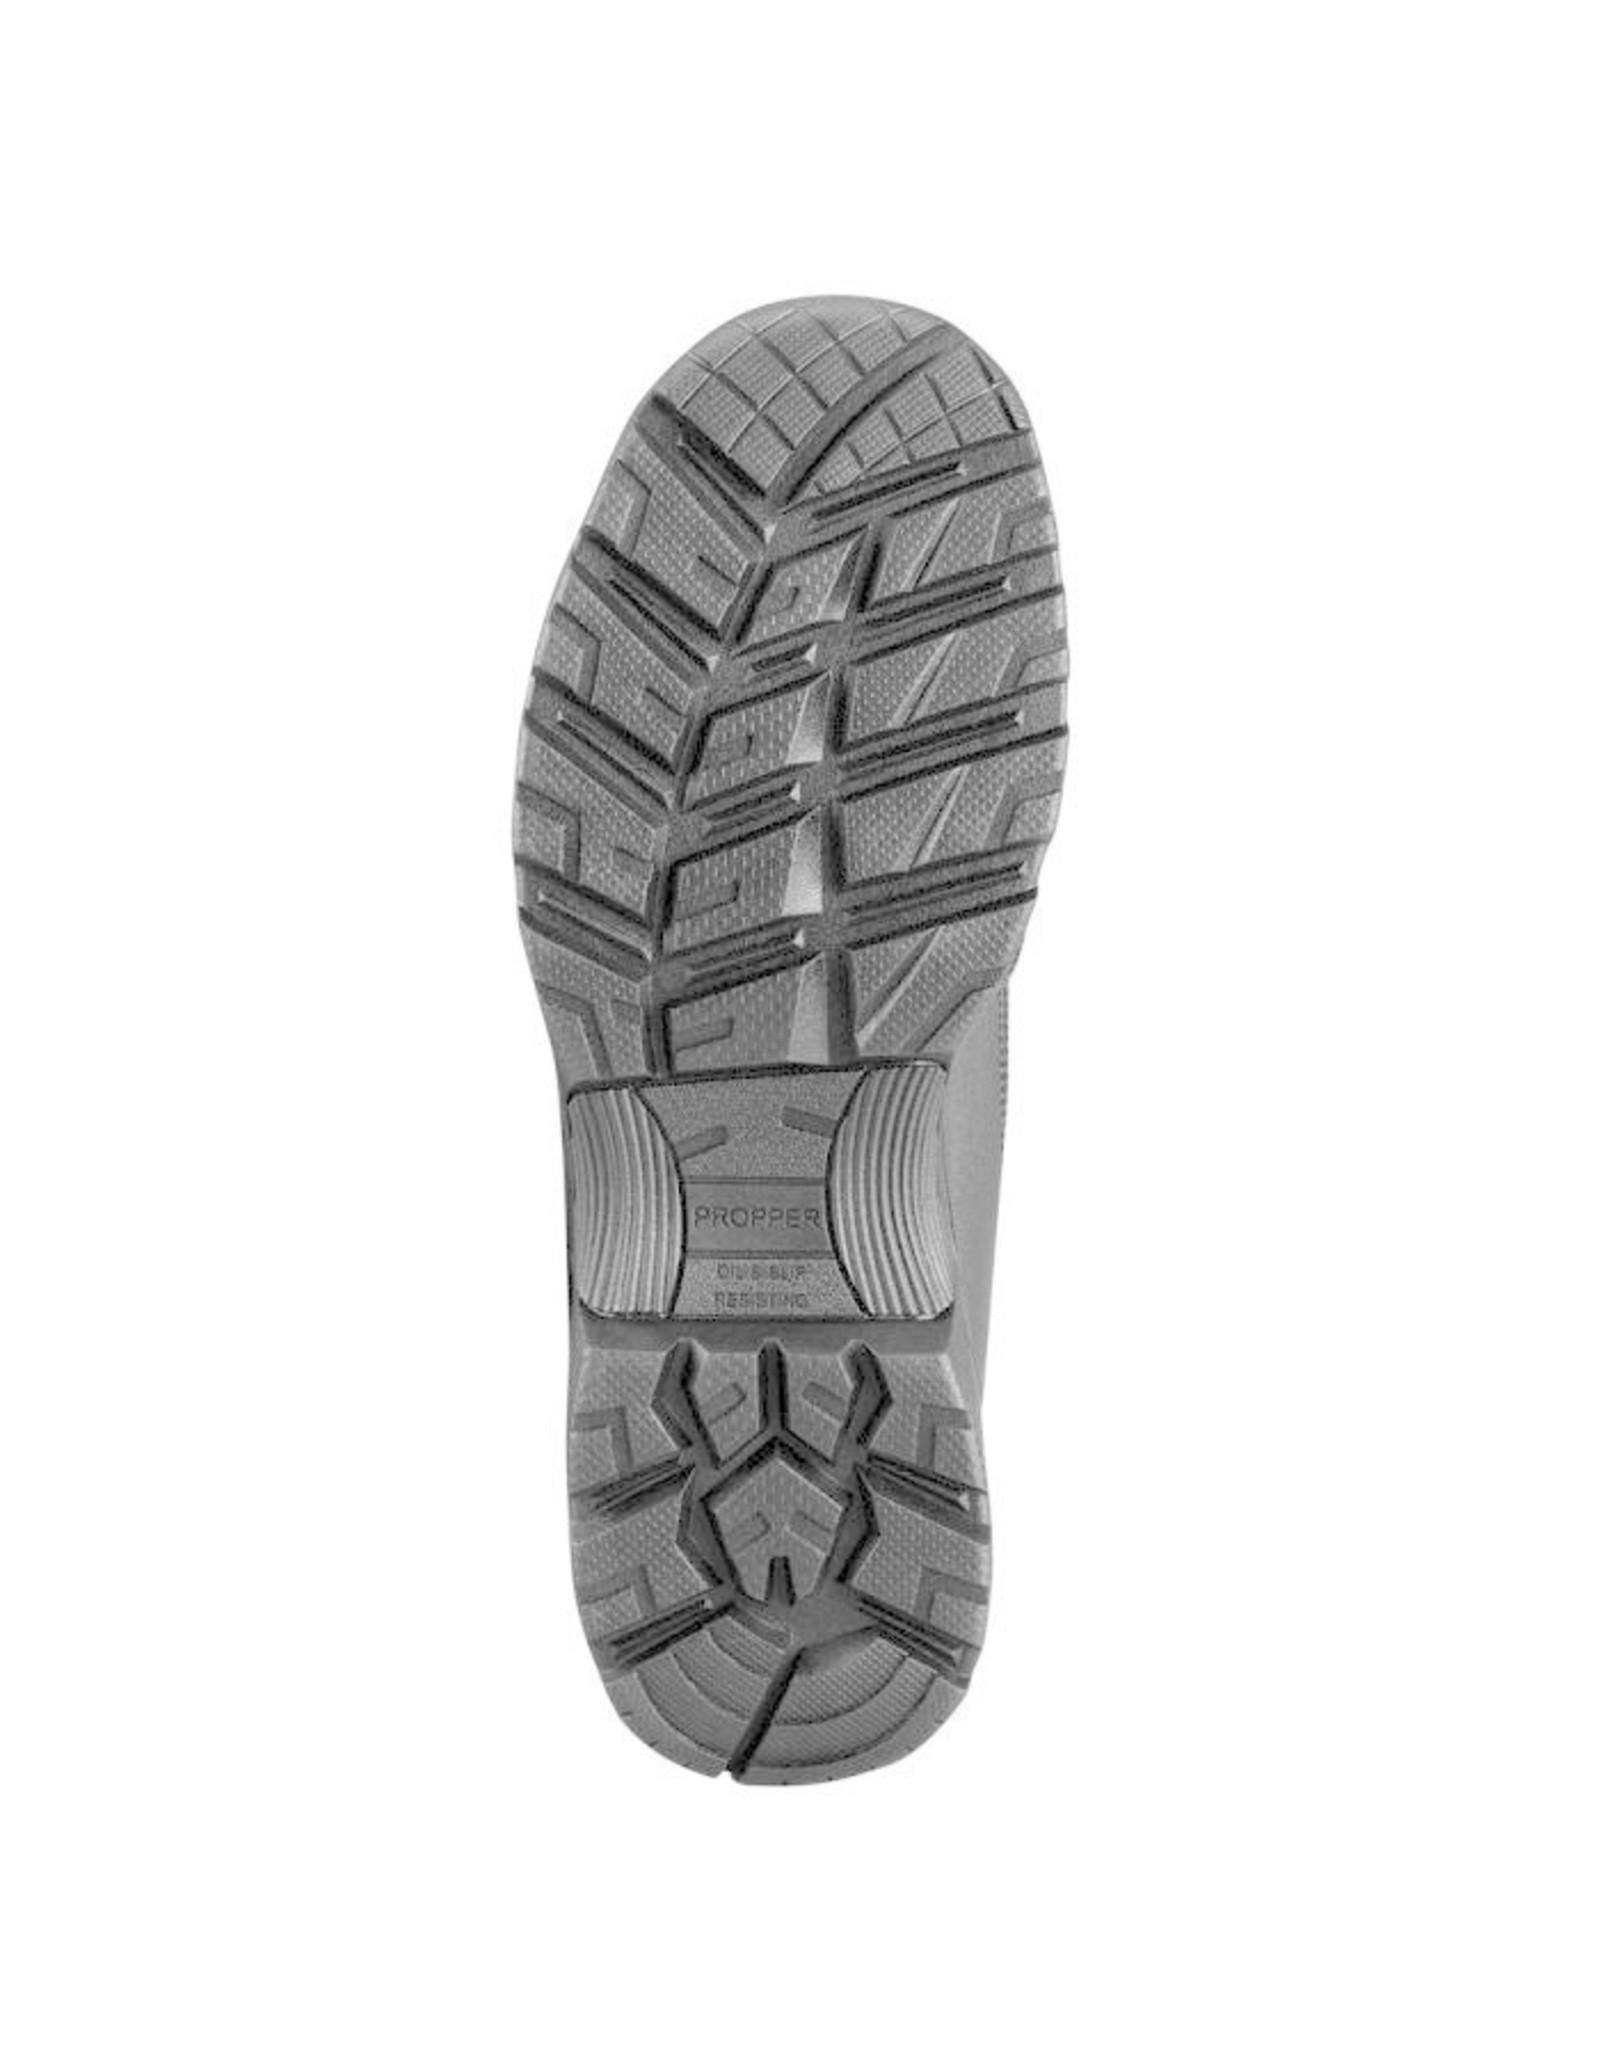 Propper Duralight Tactical Boot (Size 9.5 Mens)